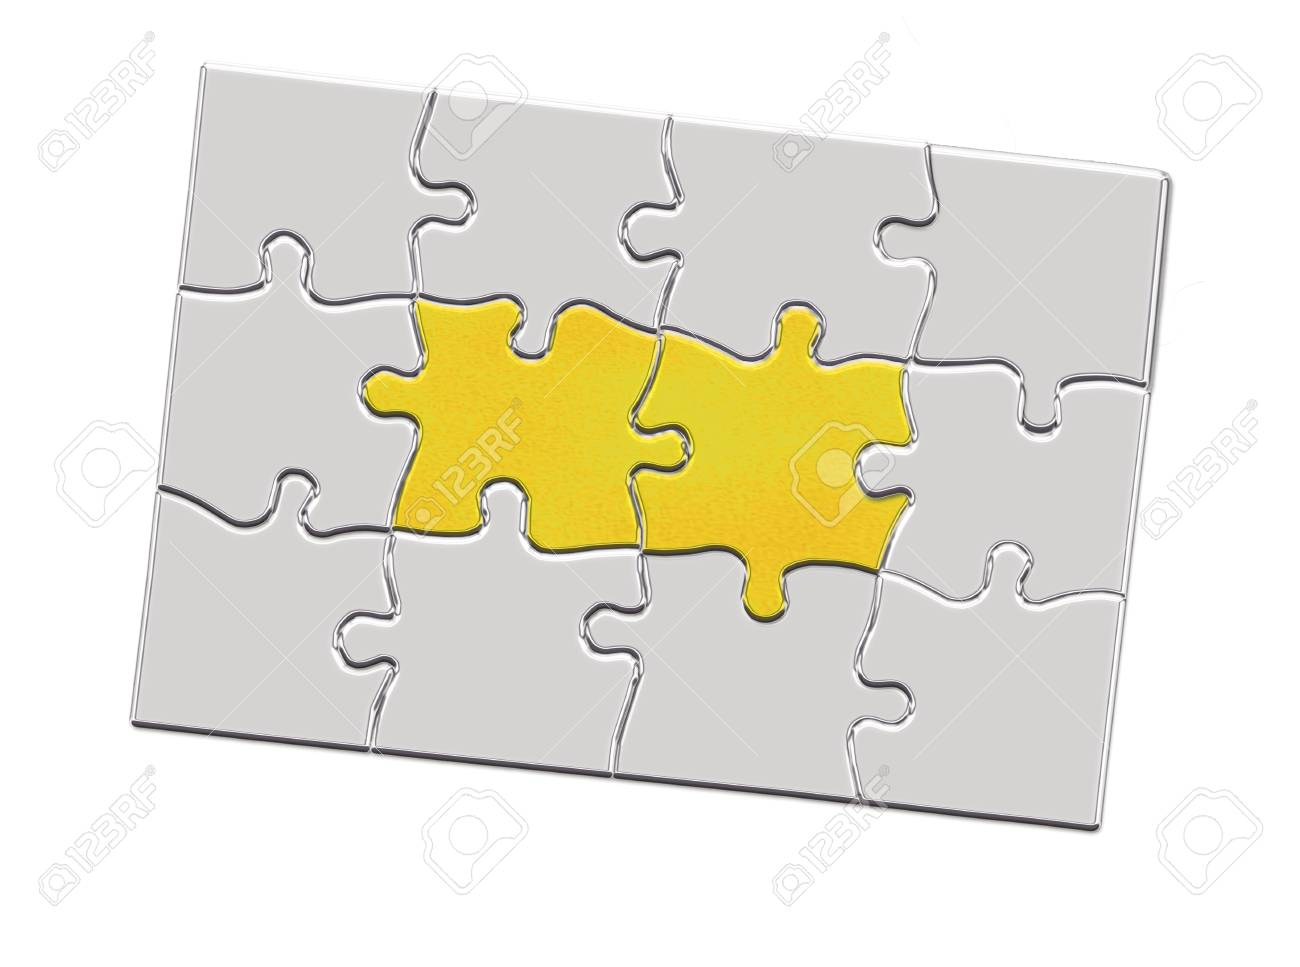 Jigsaw puzzle piece with keyhole Stock Photo - 11948529